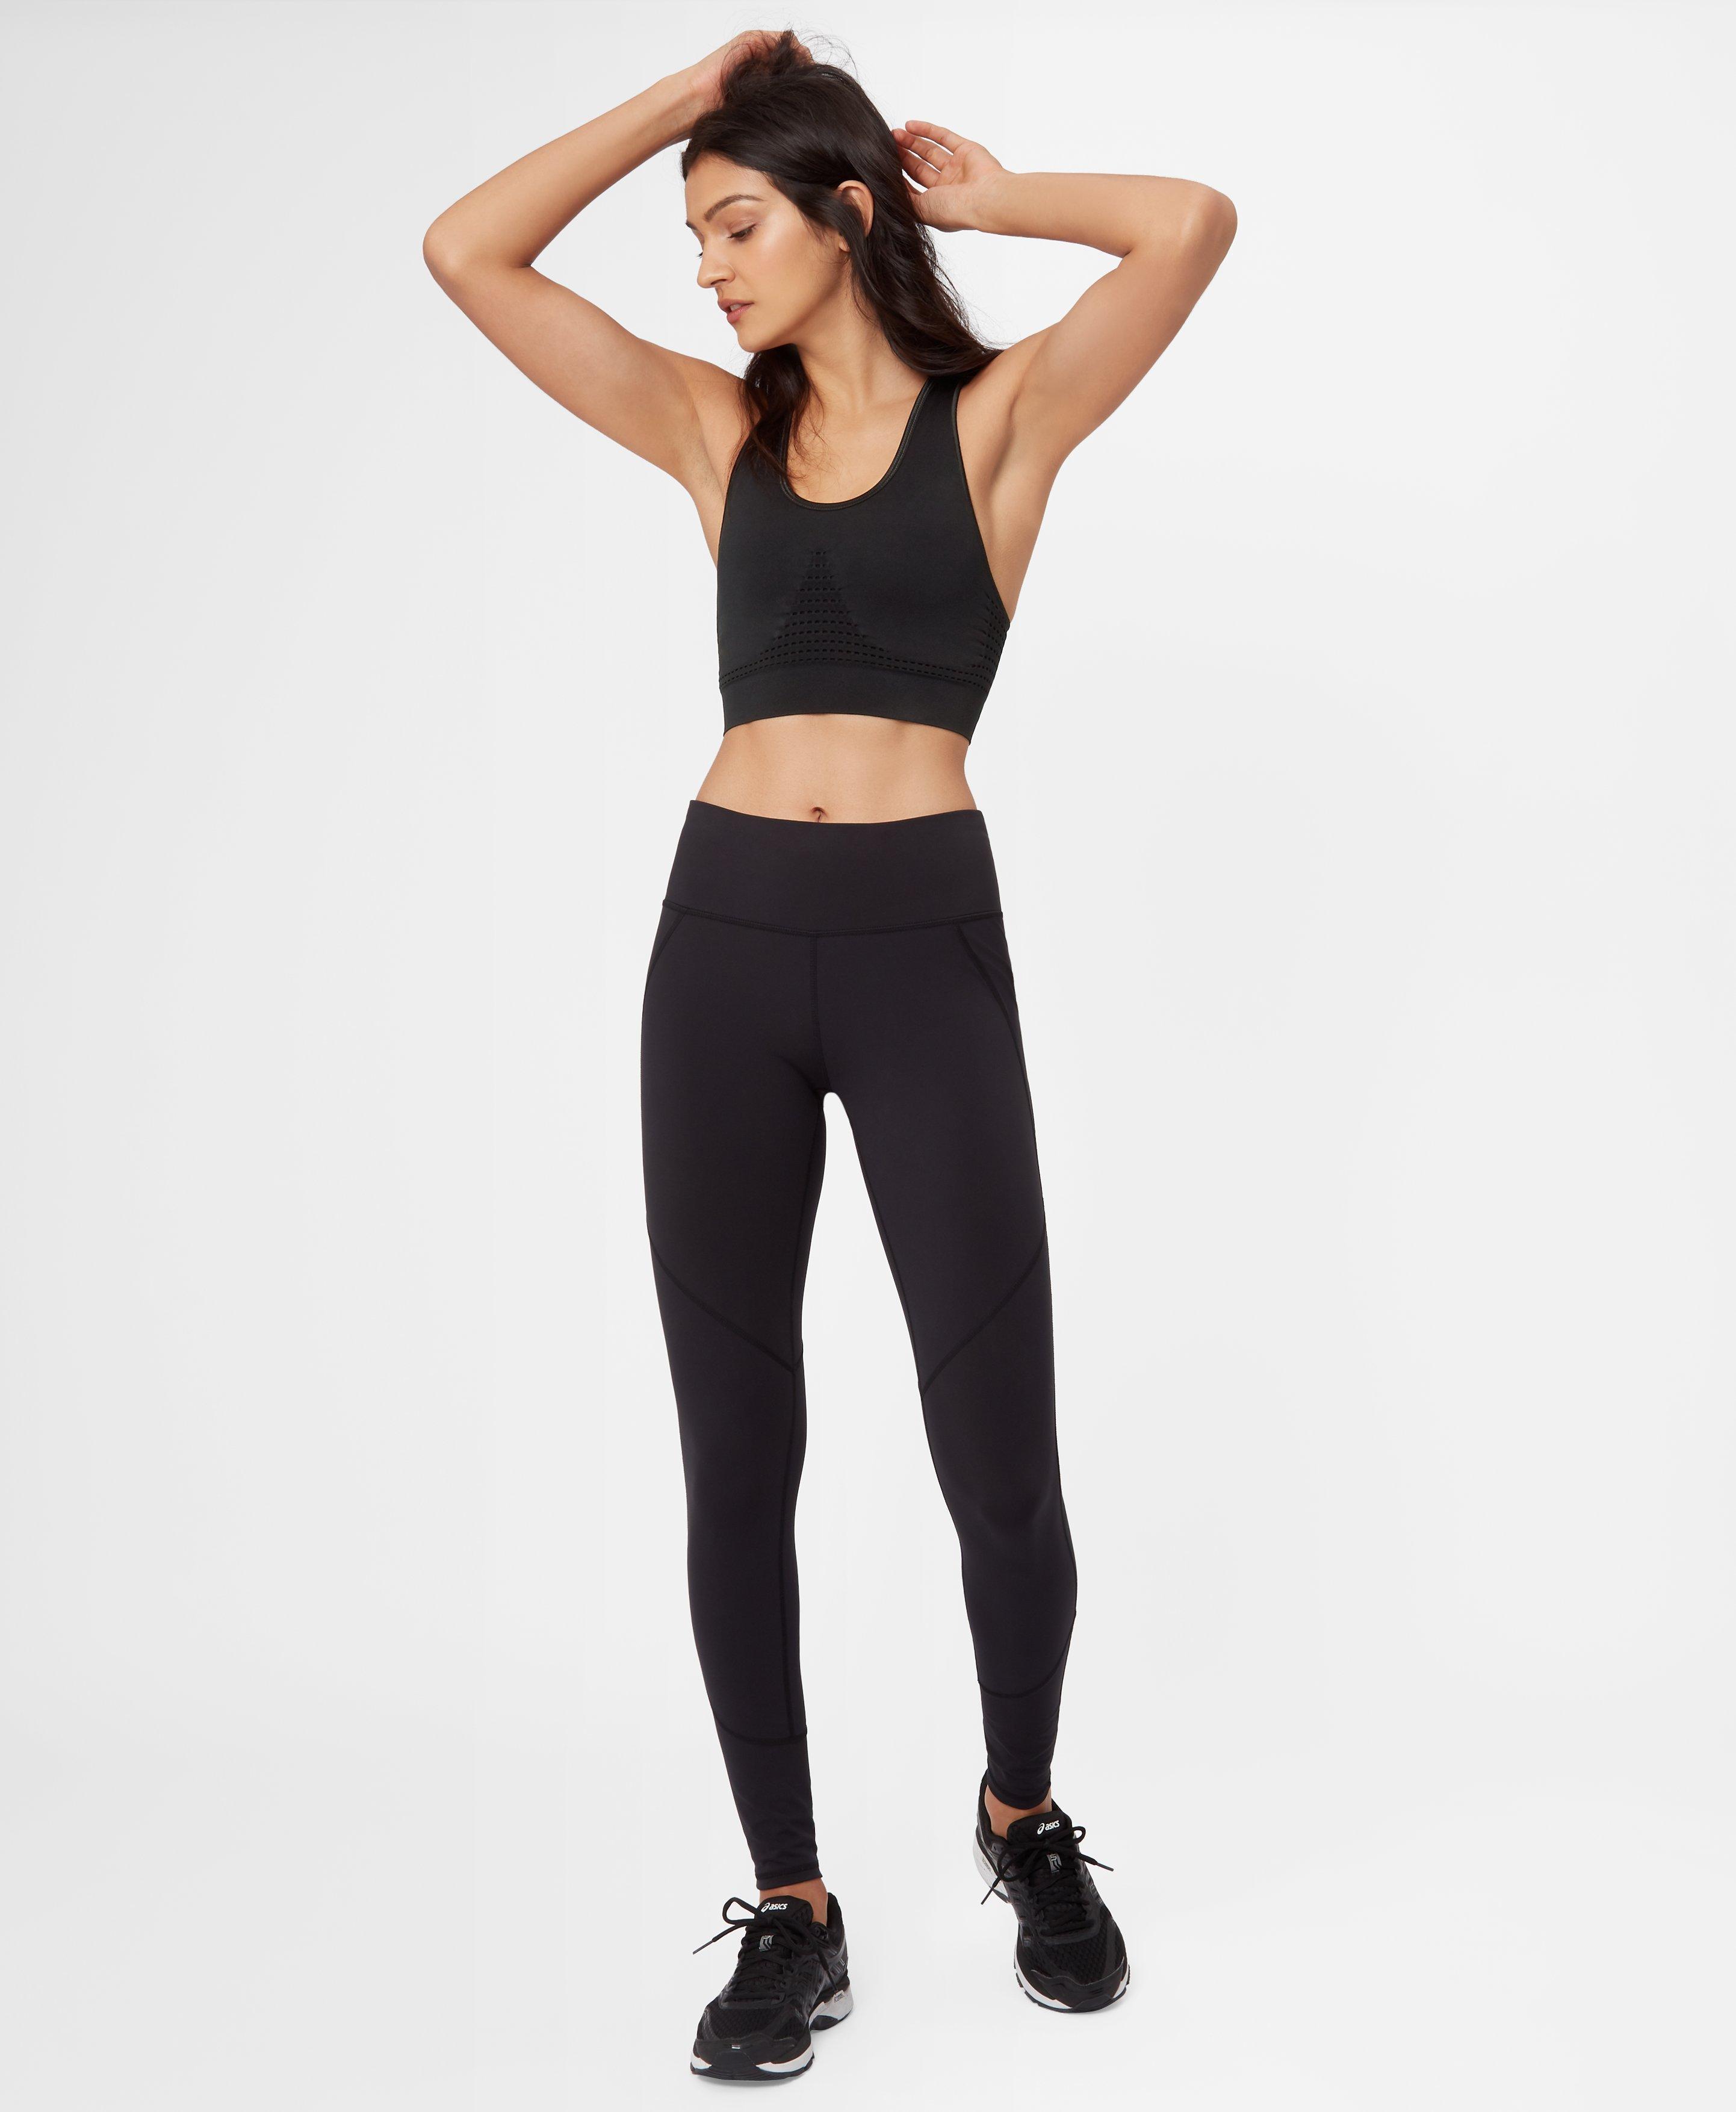 5d7df2135c83e Lyst - Sweaty Betty Stamina Workout Bra in Black